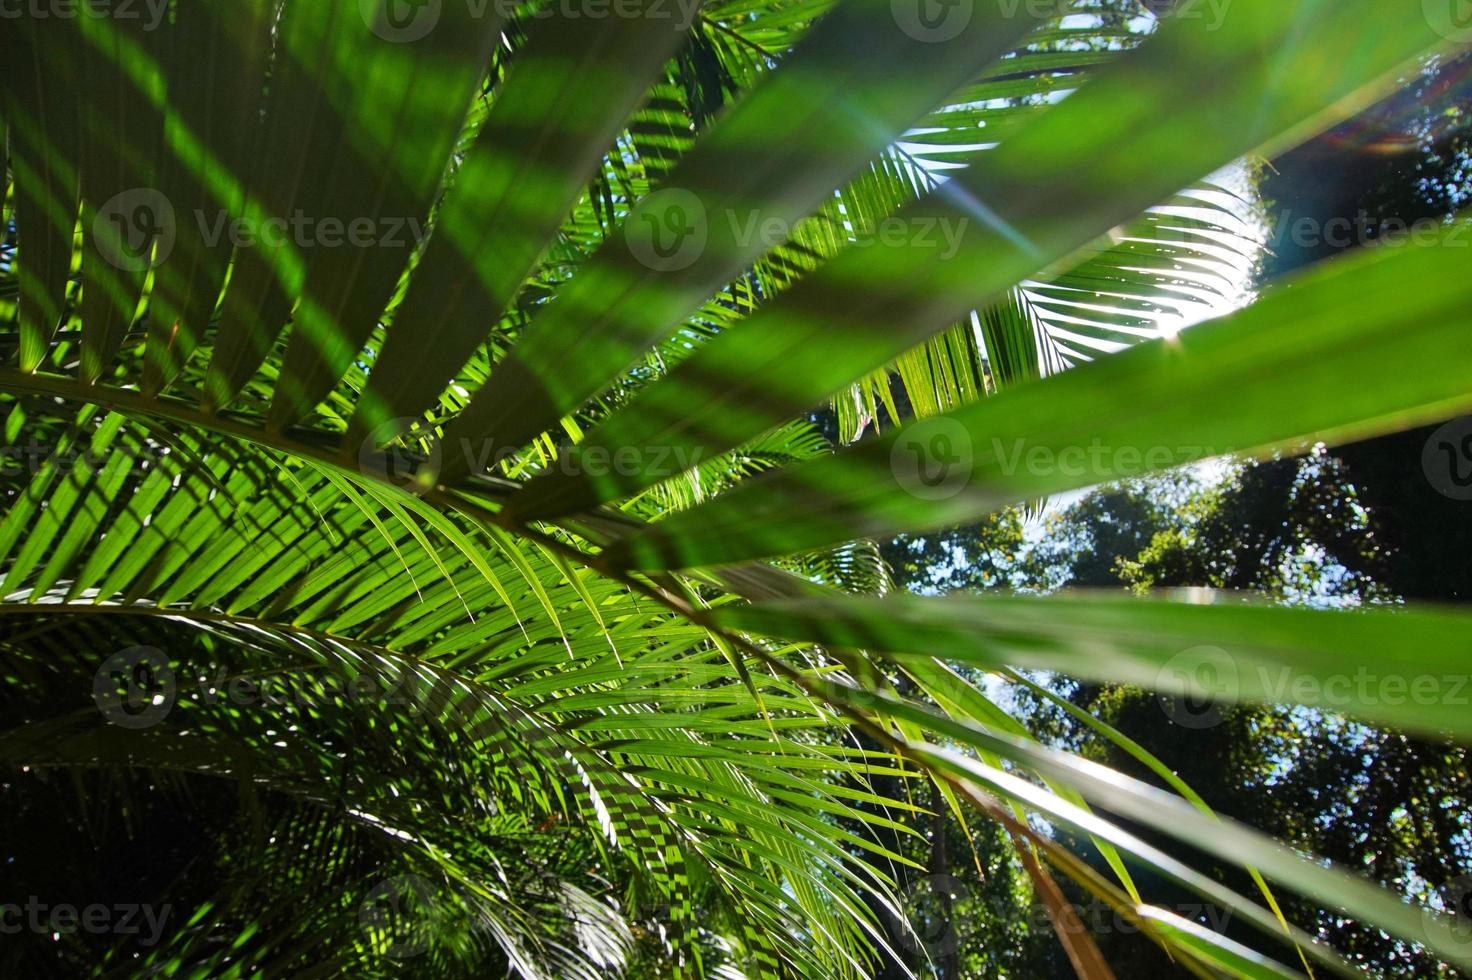 Sri Lanka, Kandy,the leaves of palm trees photo